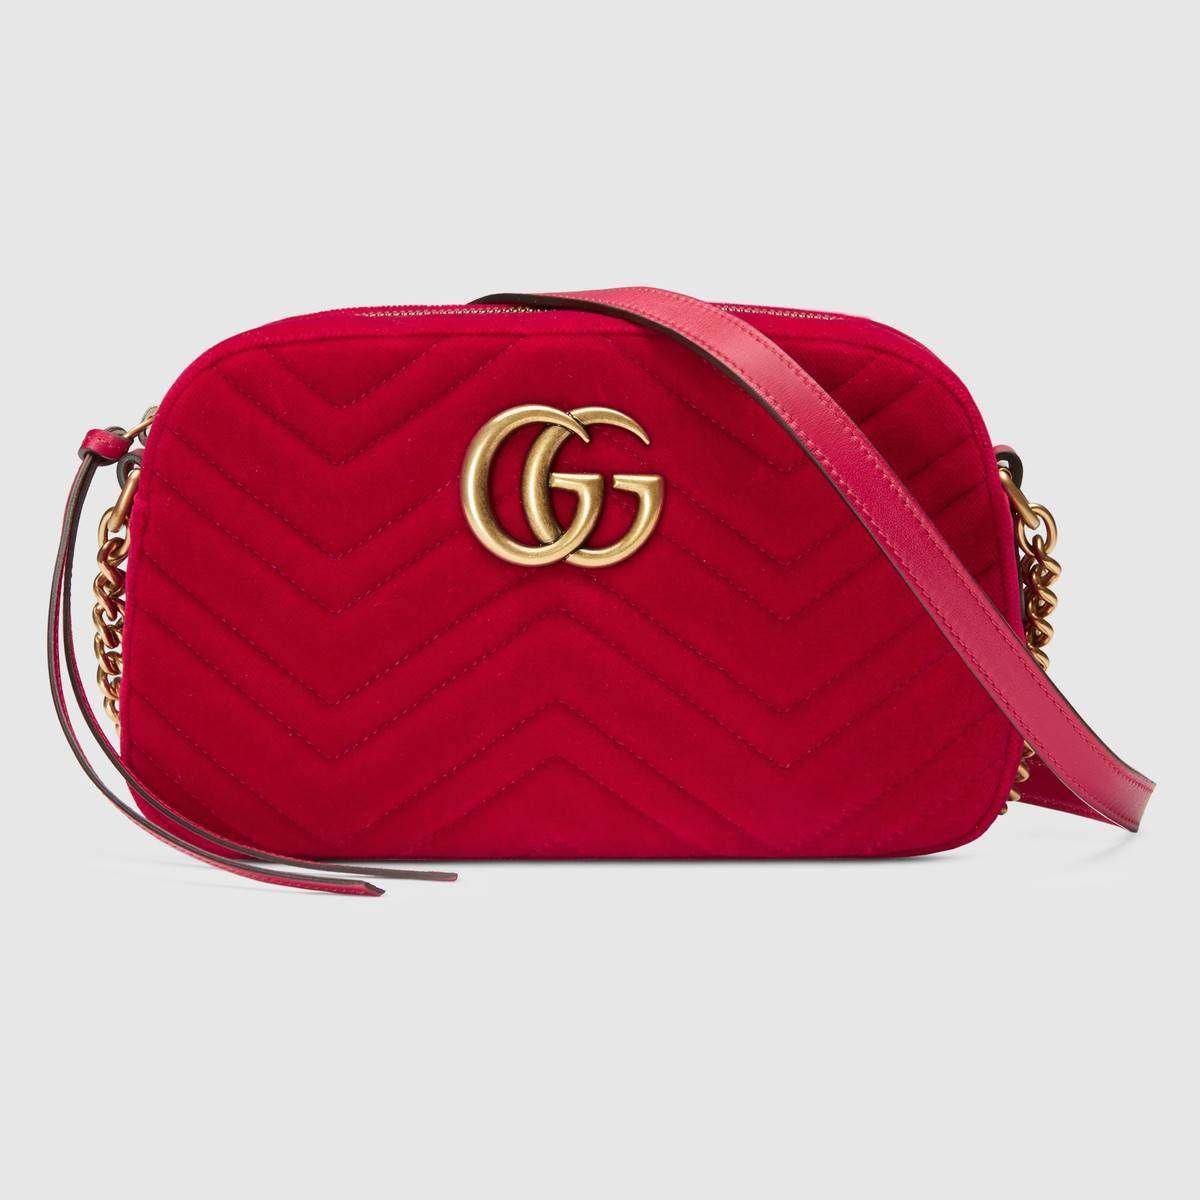 f55575fa84b1 GG Marmont velvet small shoulder bag - Gucci Women's Shoulder Bags  4476329QIBT6433